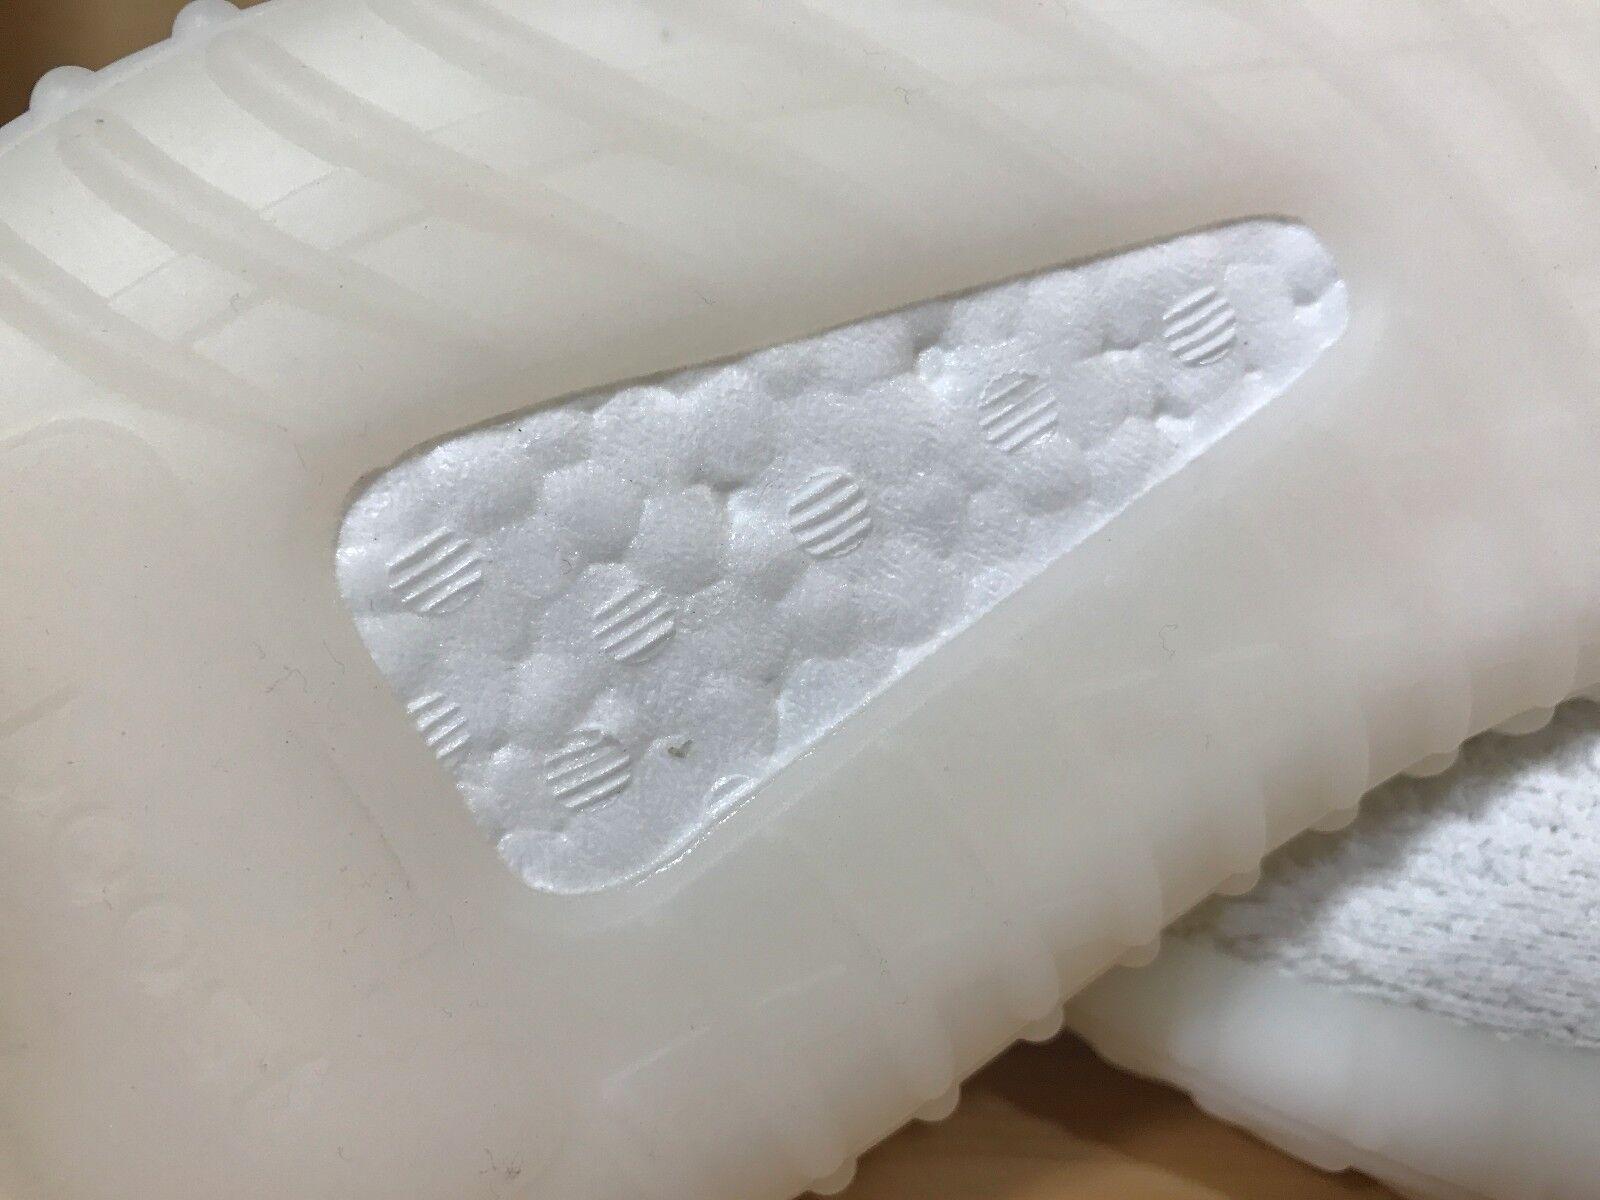 Adidas Yeezy 350 V2 Cream Cream Cream White 2017 Boost Low SPLY Kanye West CP9366 SZ 4-14 041432